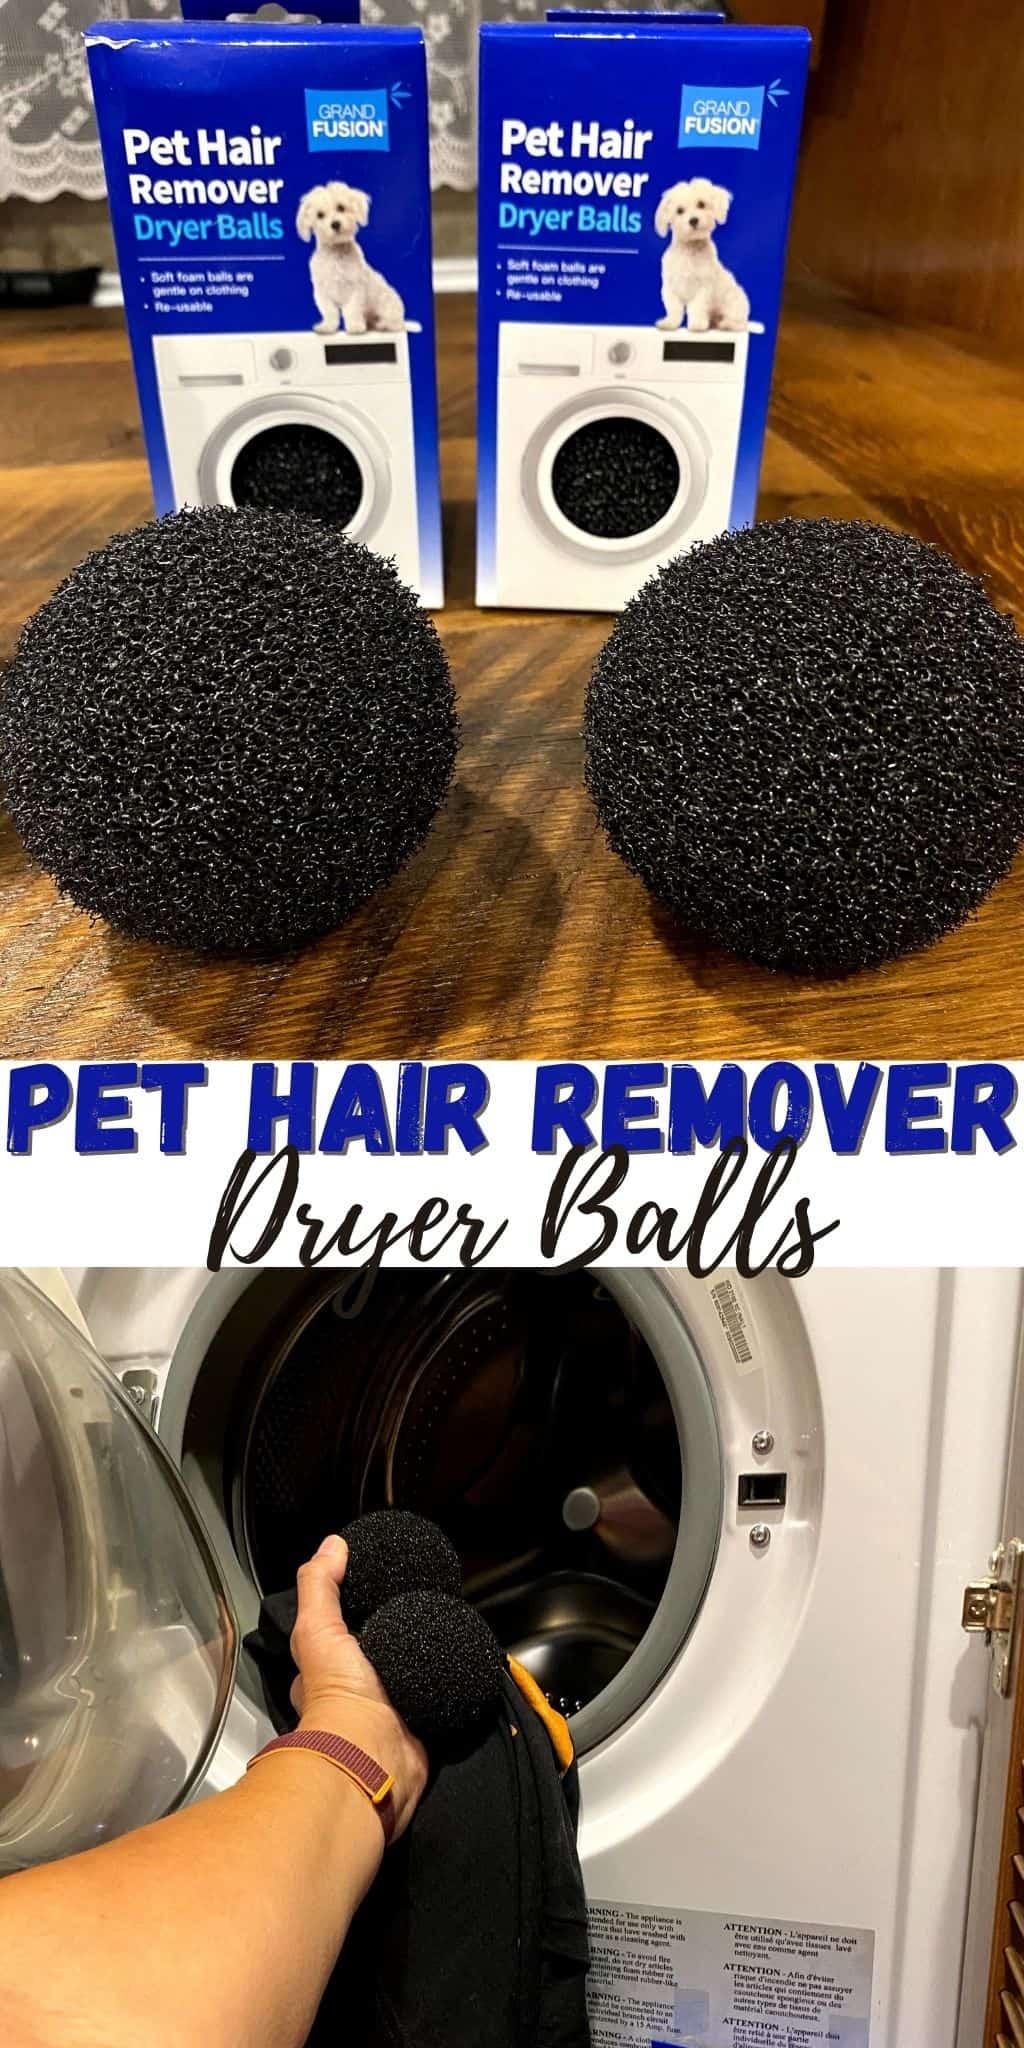 Pet Hair Remover Dryer Balls